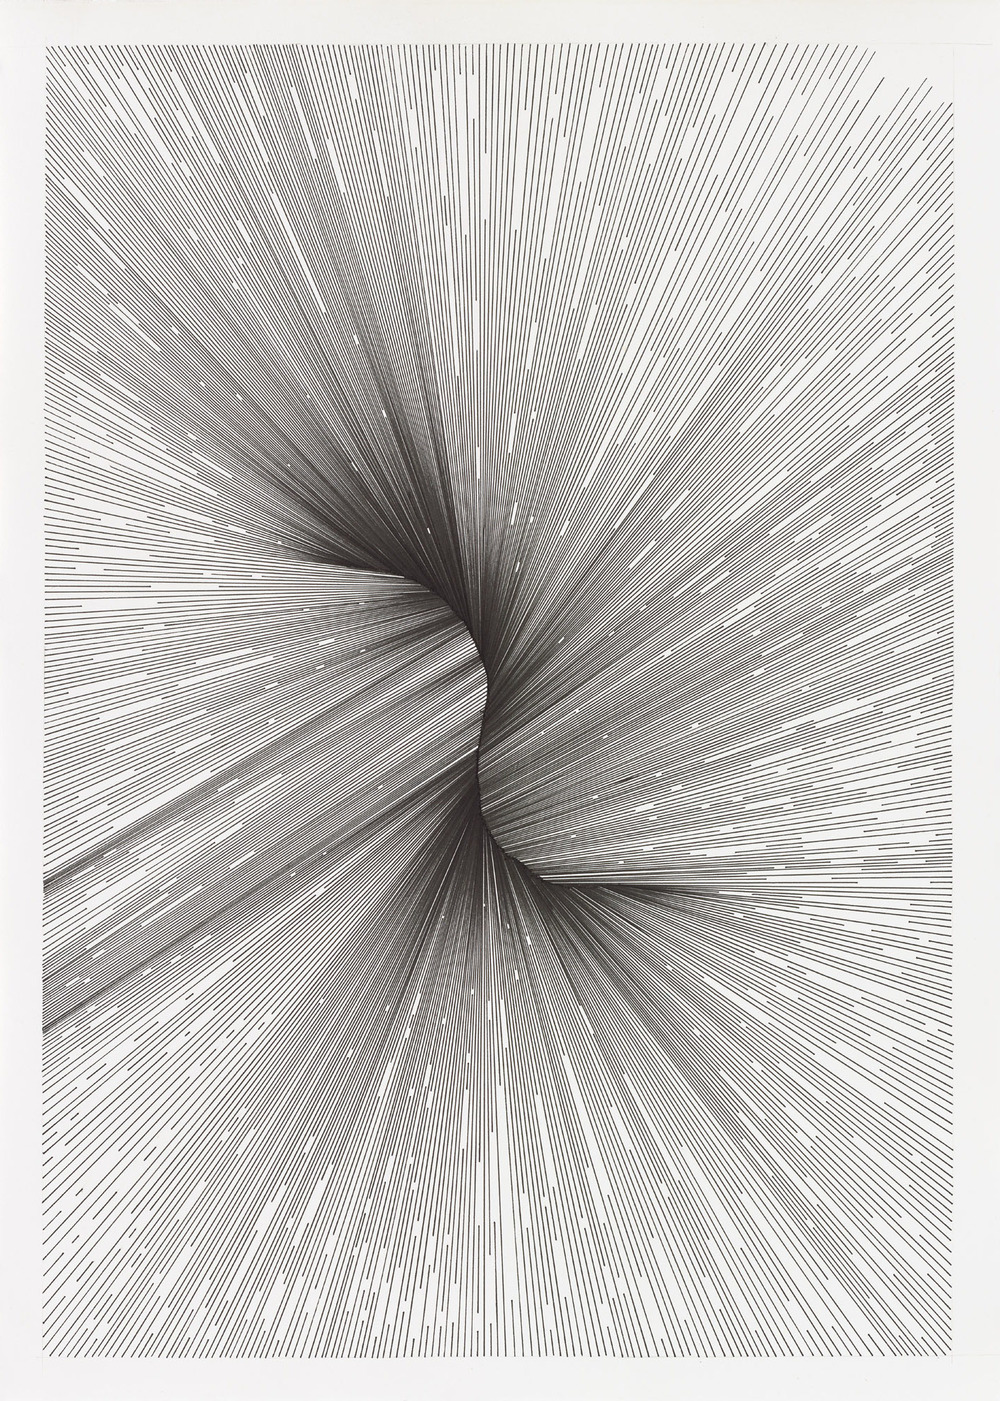 BK P18207 | untitled | pigment liner on paper | 59x42cm | 2016